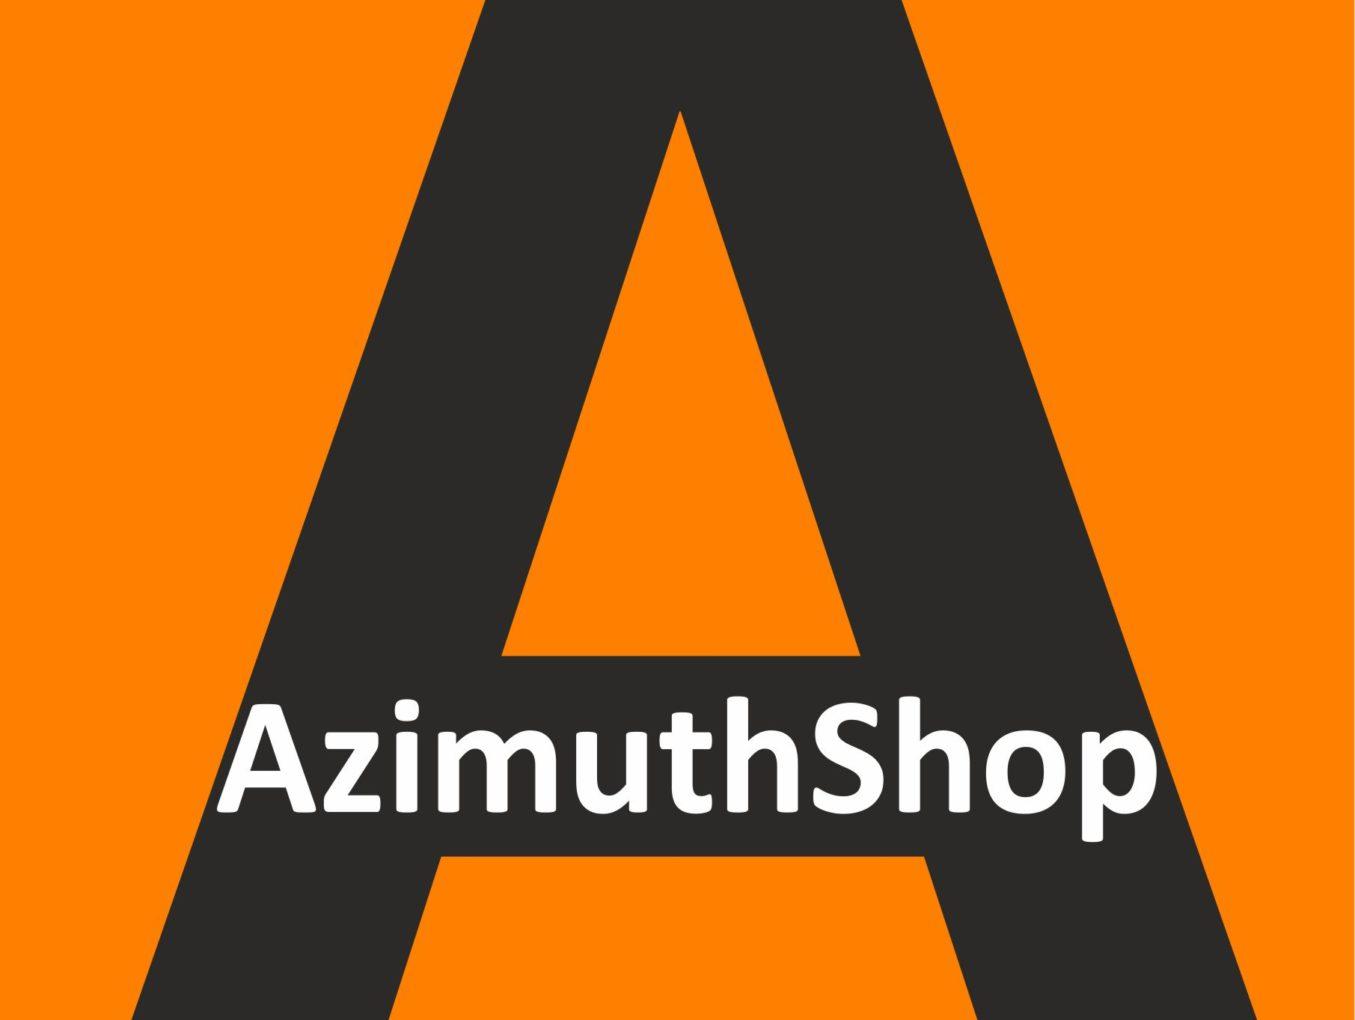 Azimuthshop